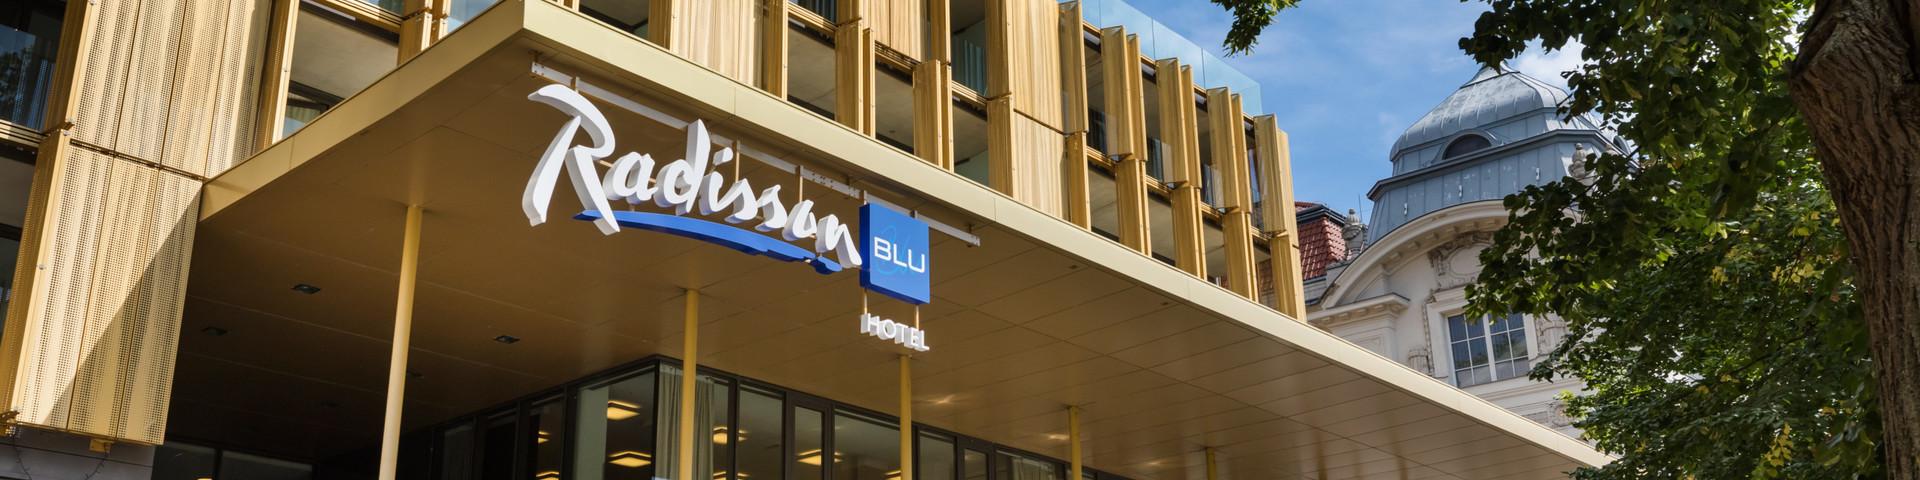 Radisson Blu Park Royal Palace Hotel - Aussenansicht - © Austria Trend Hotels